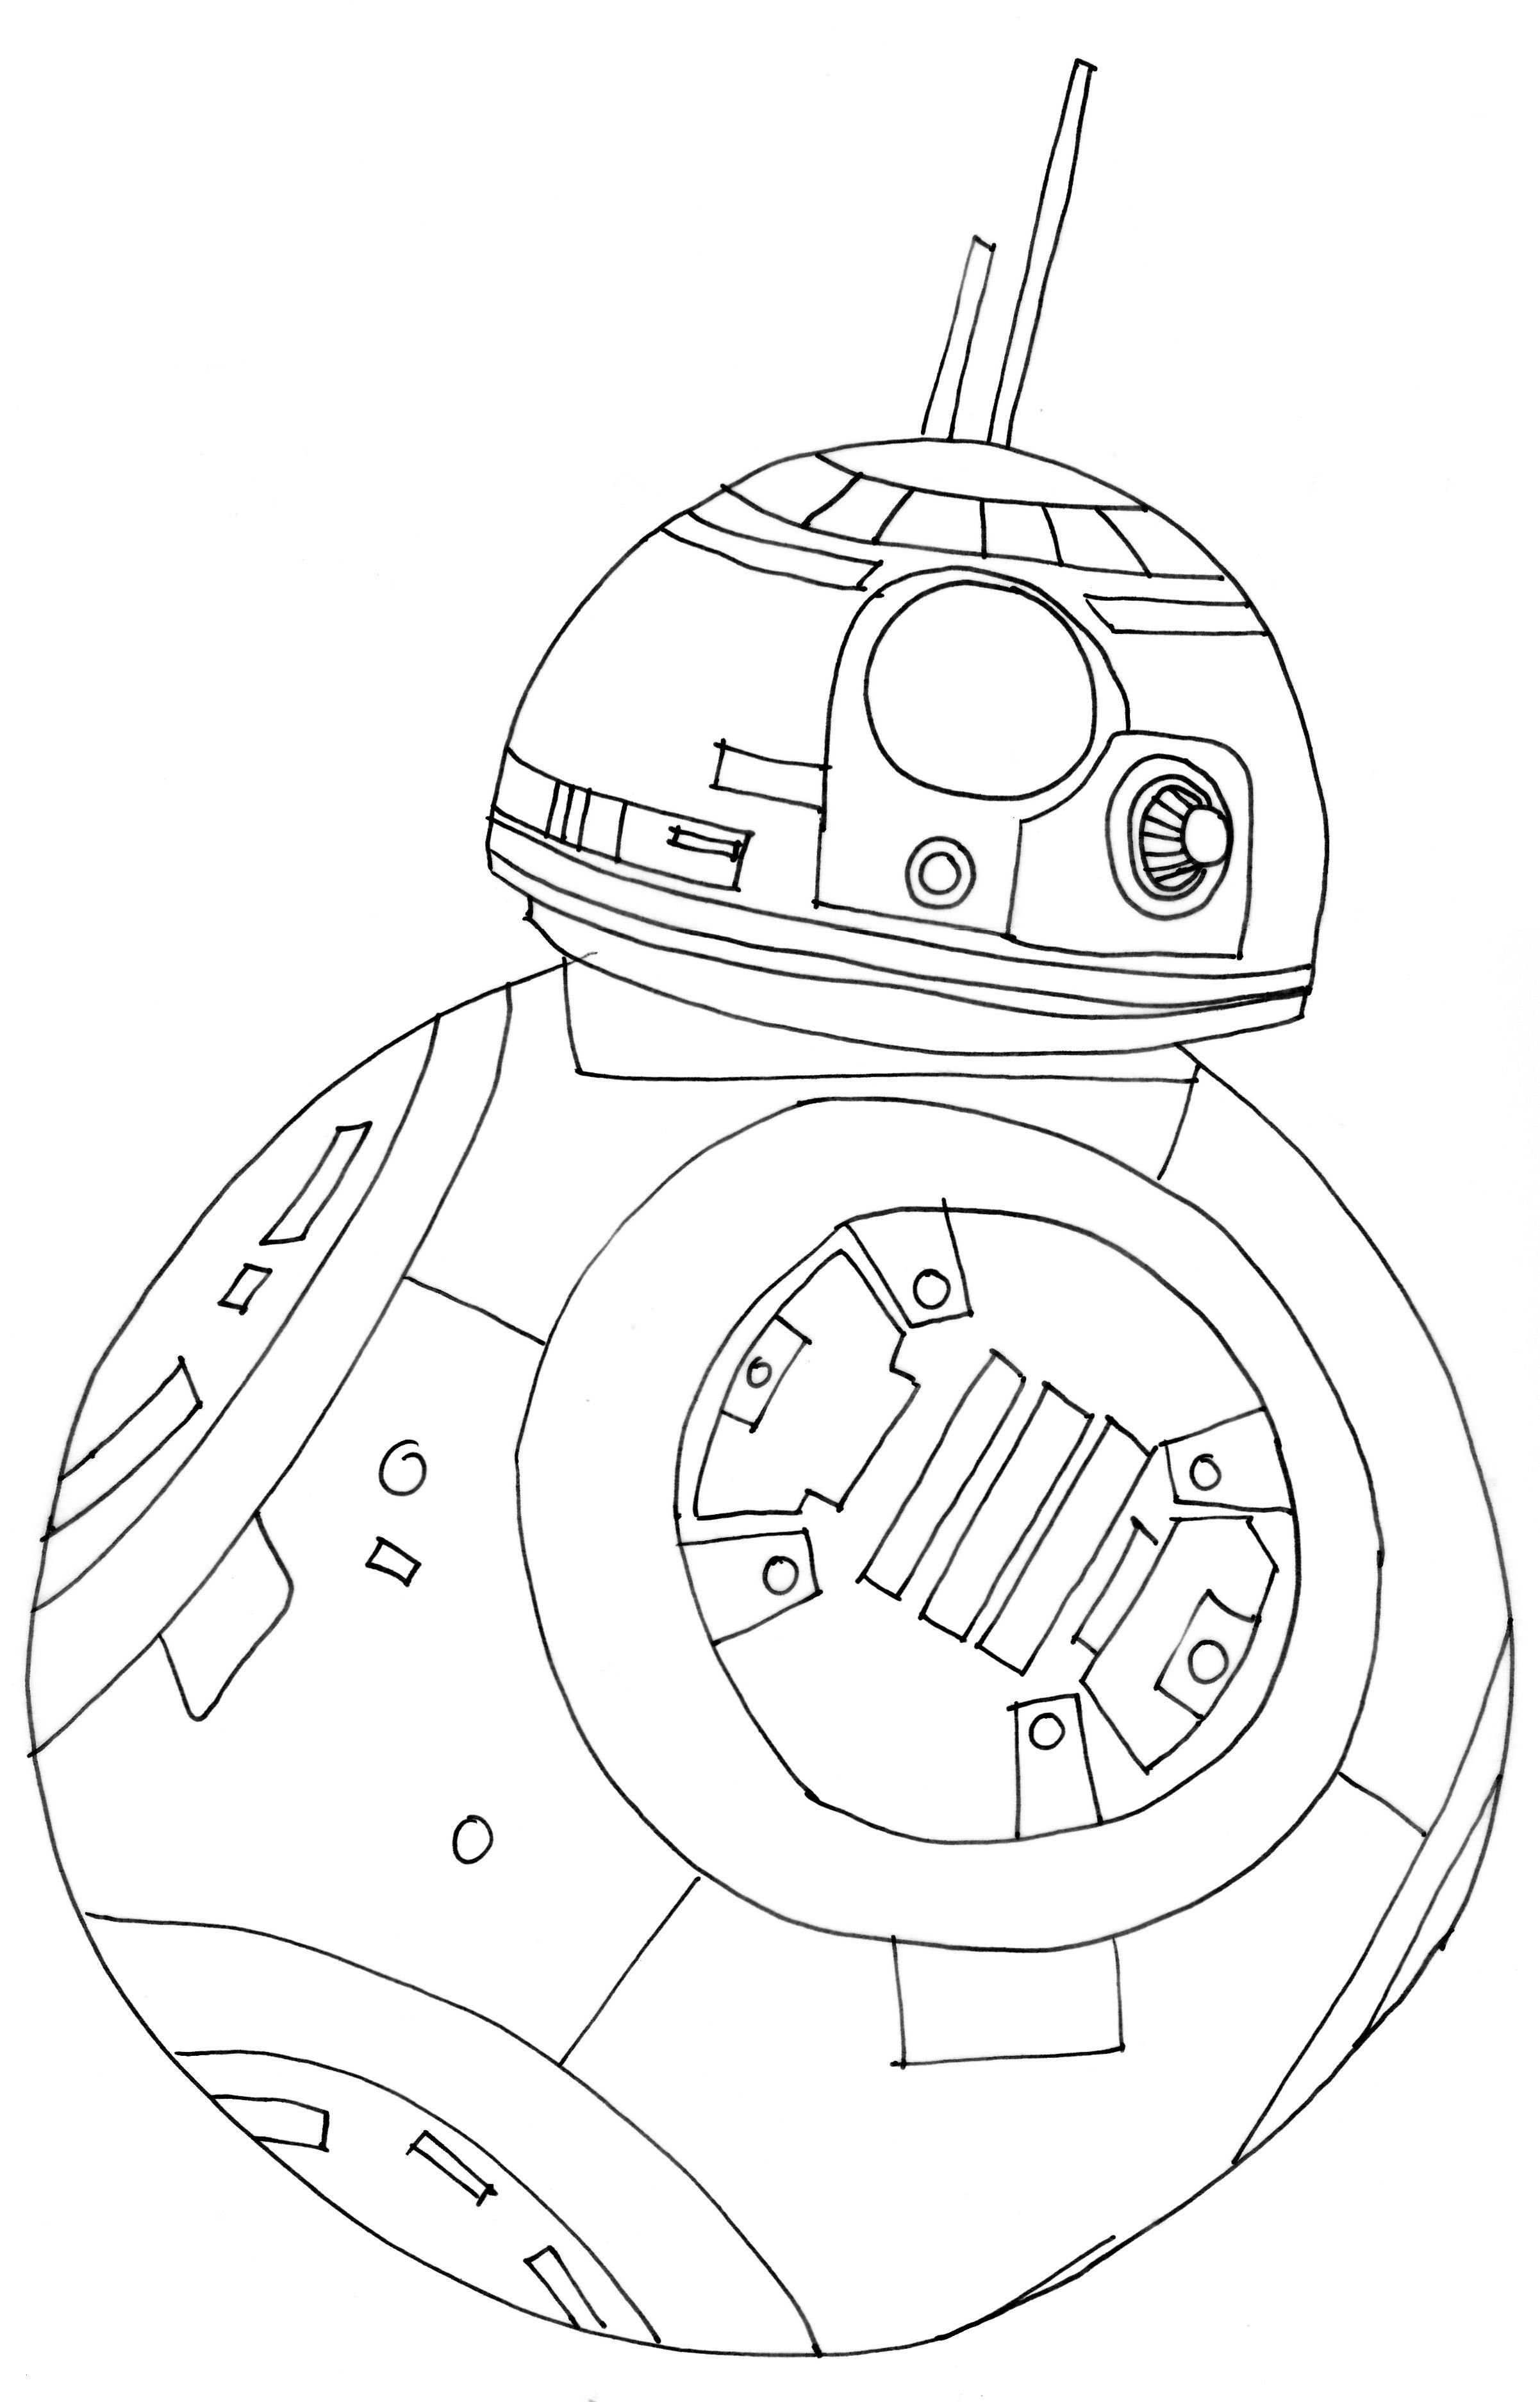 Frisch Malvorlagen Tiere Bauernhof Kostenlos Space Coloring Pages Star Wars Coloring Book Printable Coloring Pages